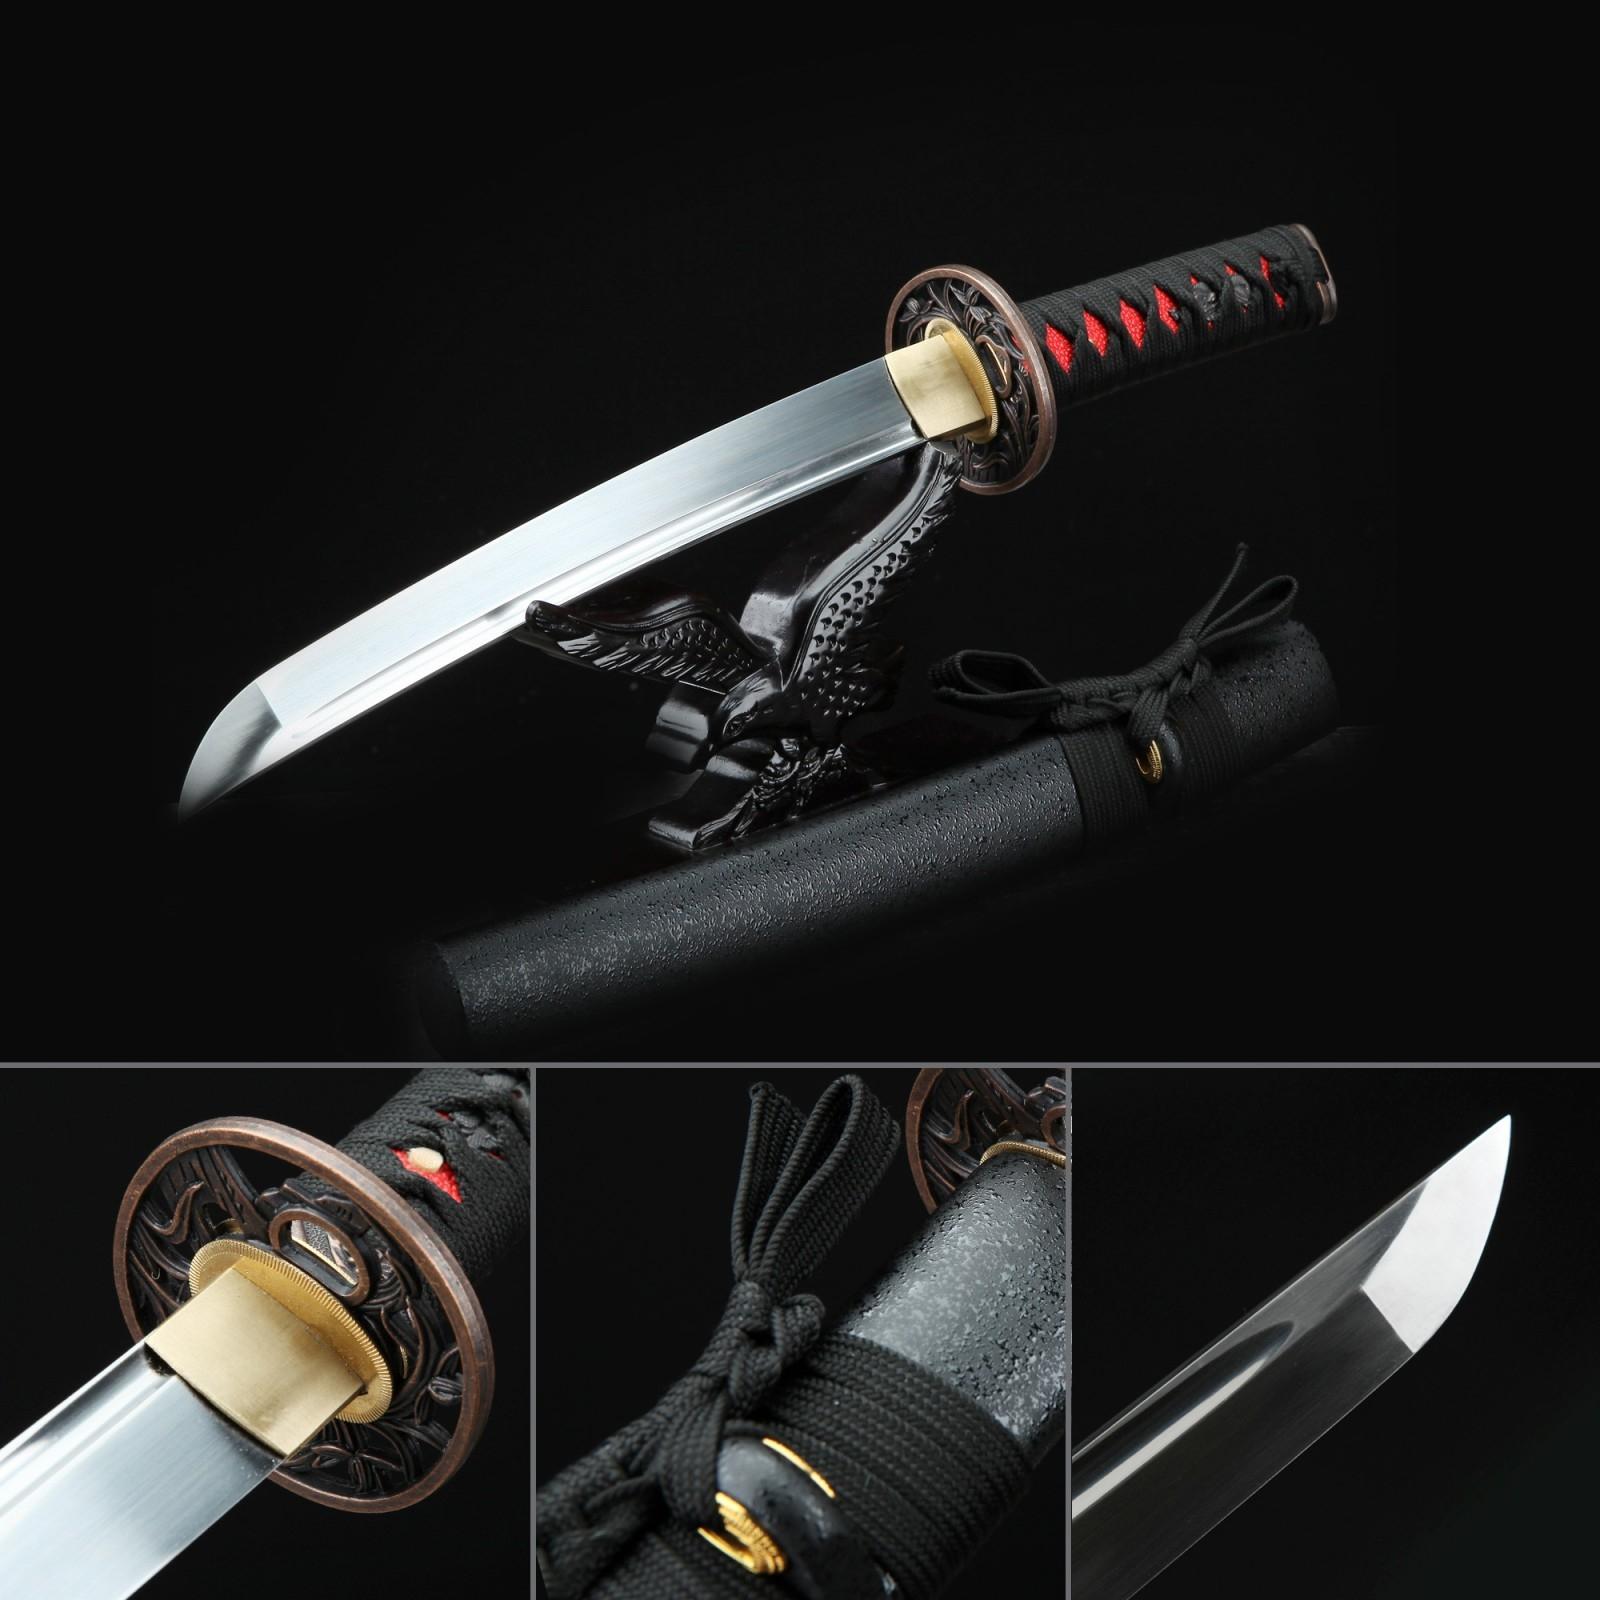 Orchid Tsuba Theme Handmade Full Tang Carbon Steeel Tanto Sword Short Katana